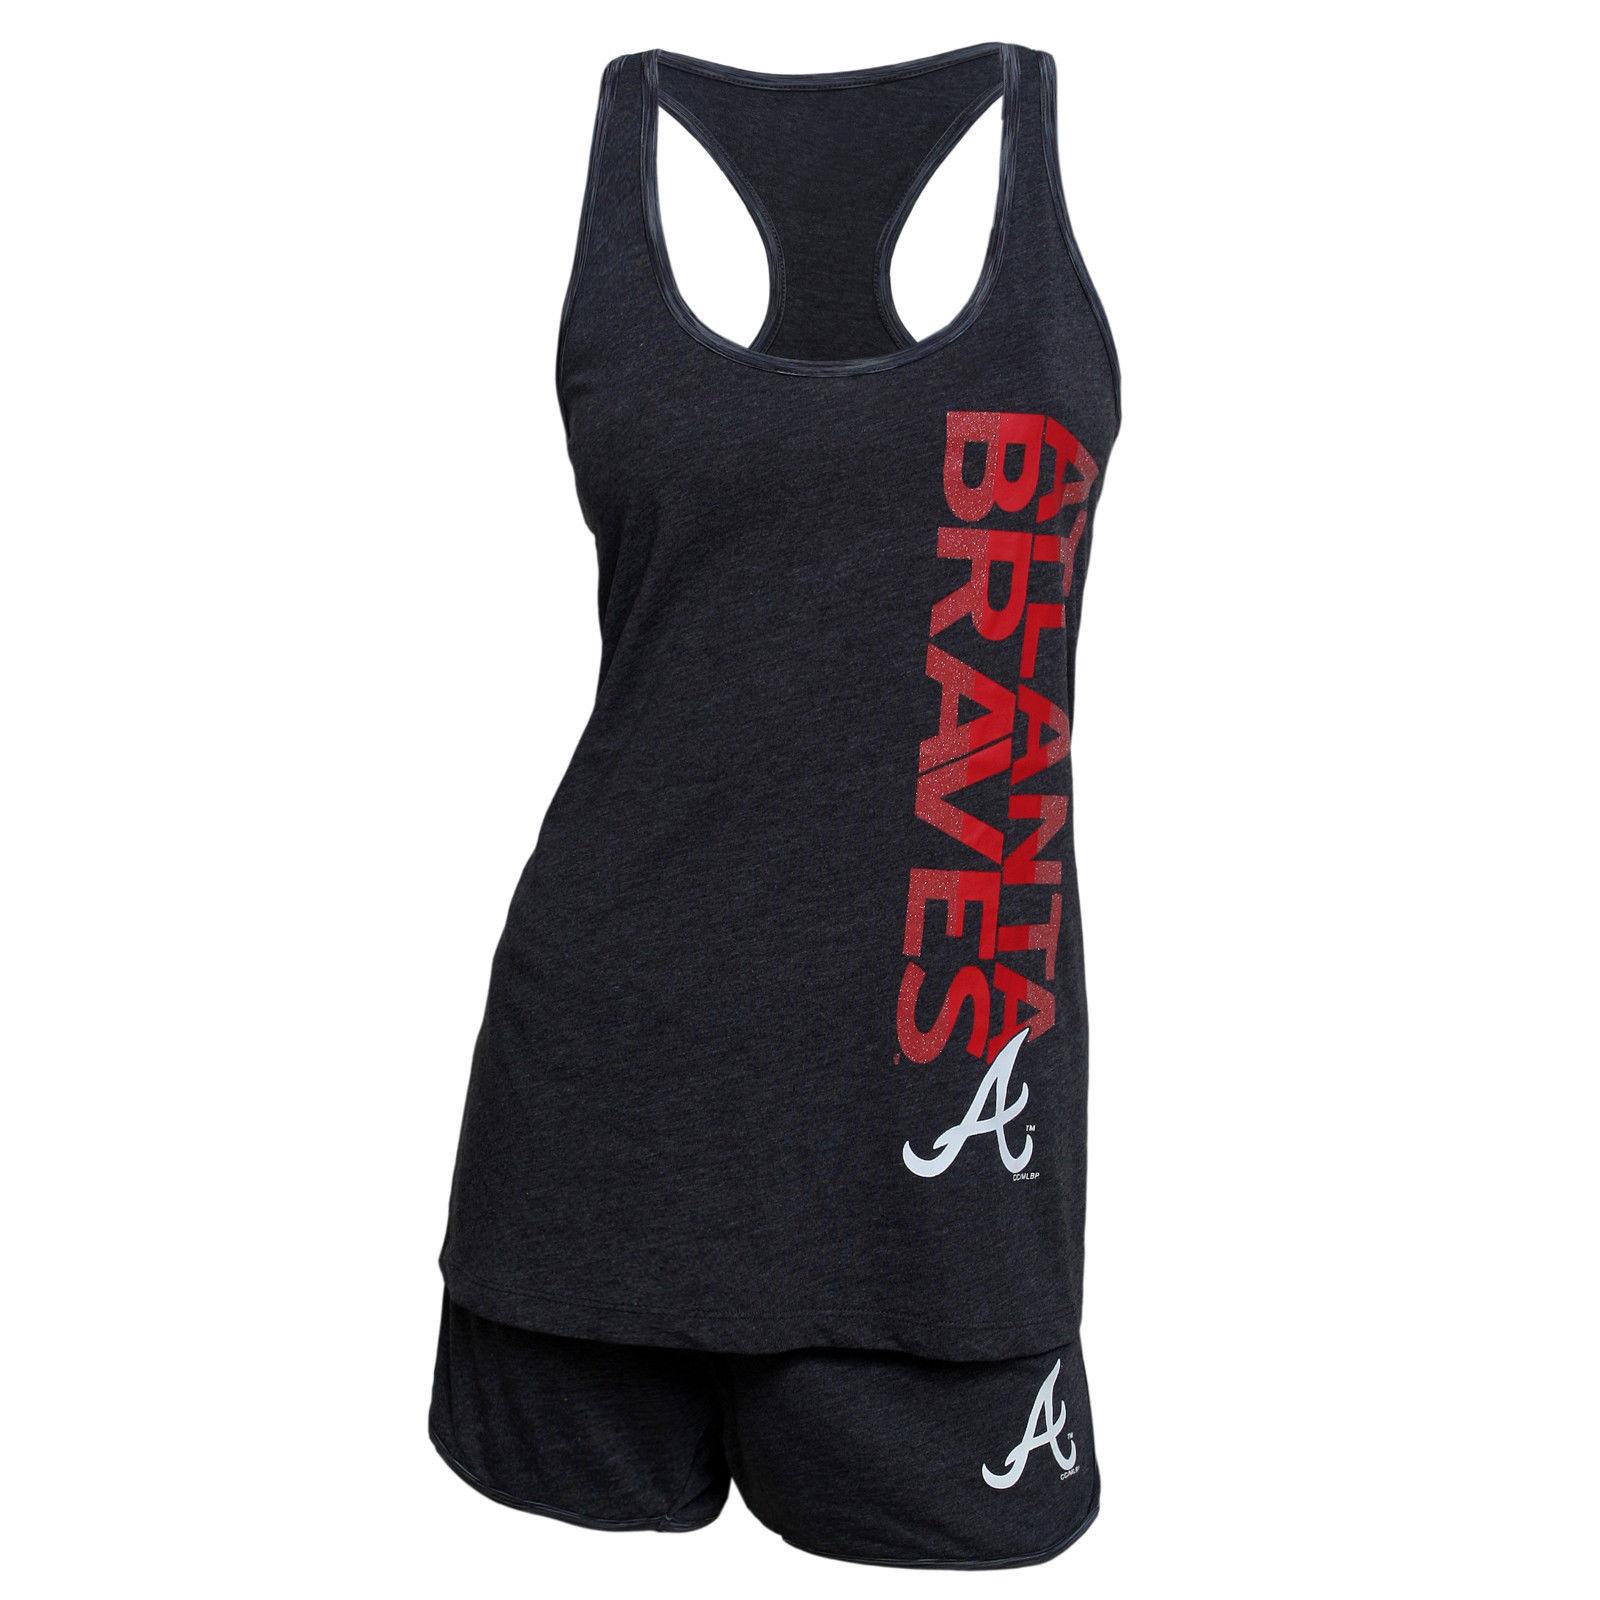 Ladies Atlanta Braves Latitude Tank & Shorts Set MLB Sleepwear Shirt Women's